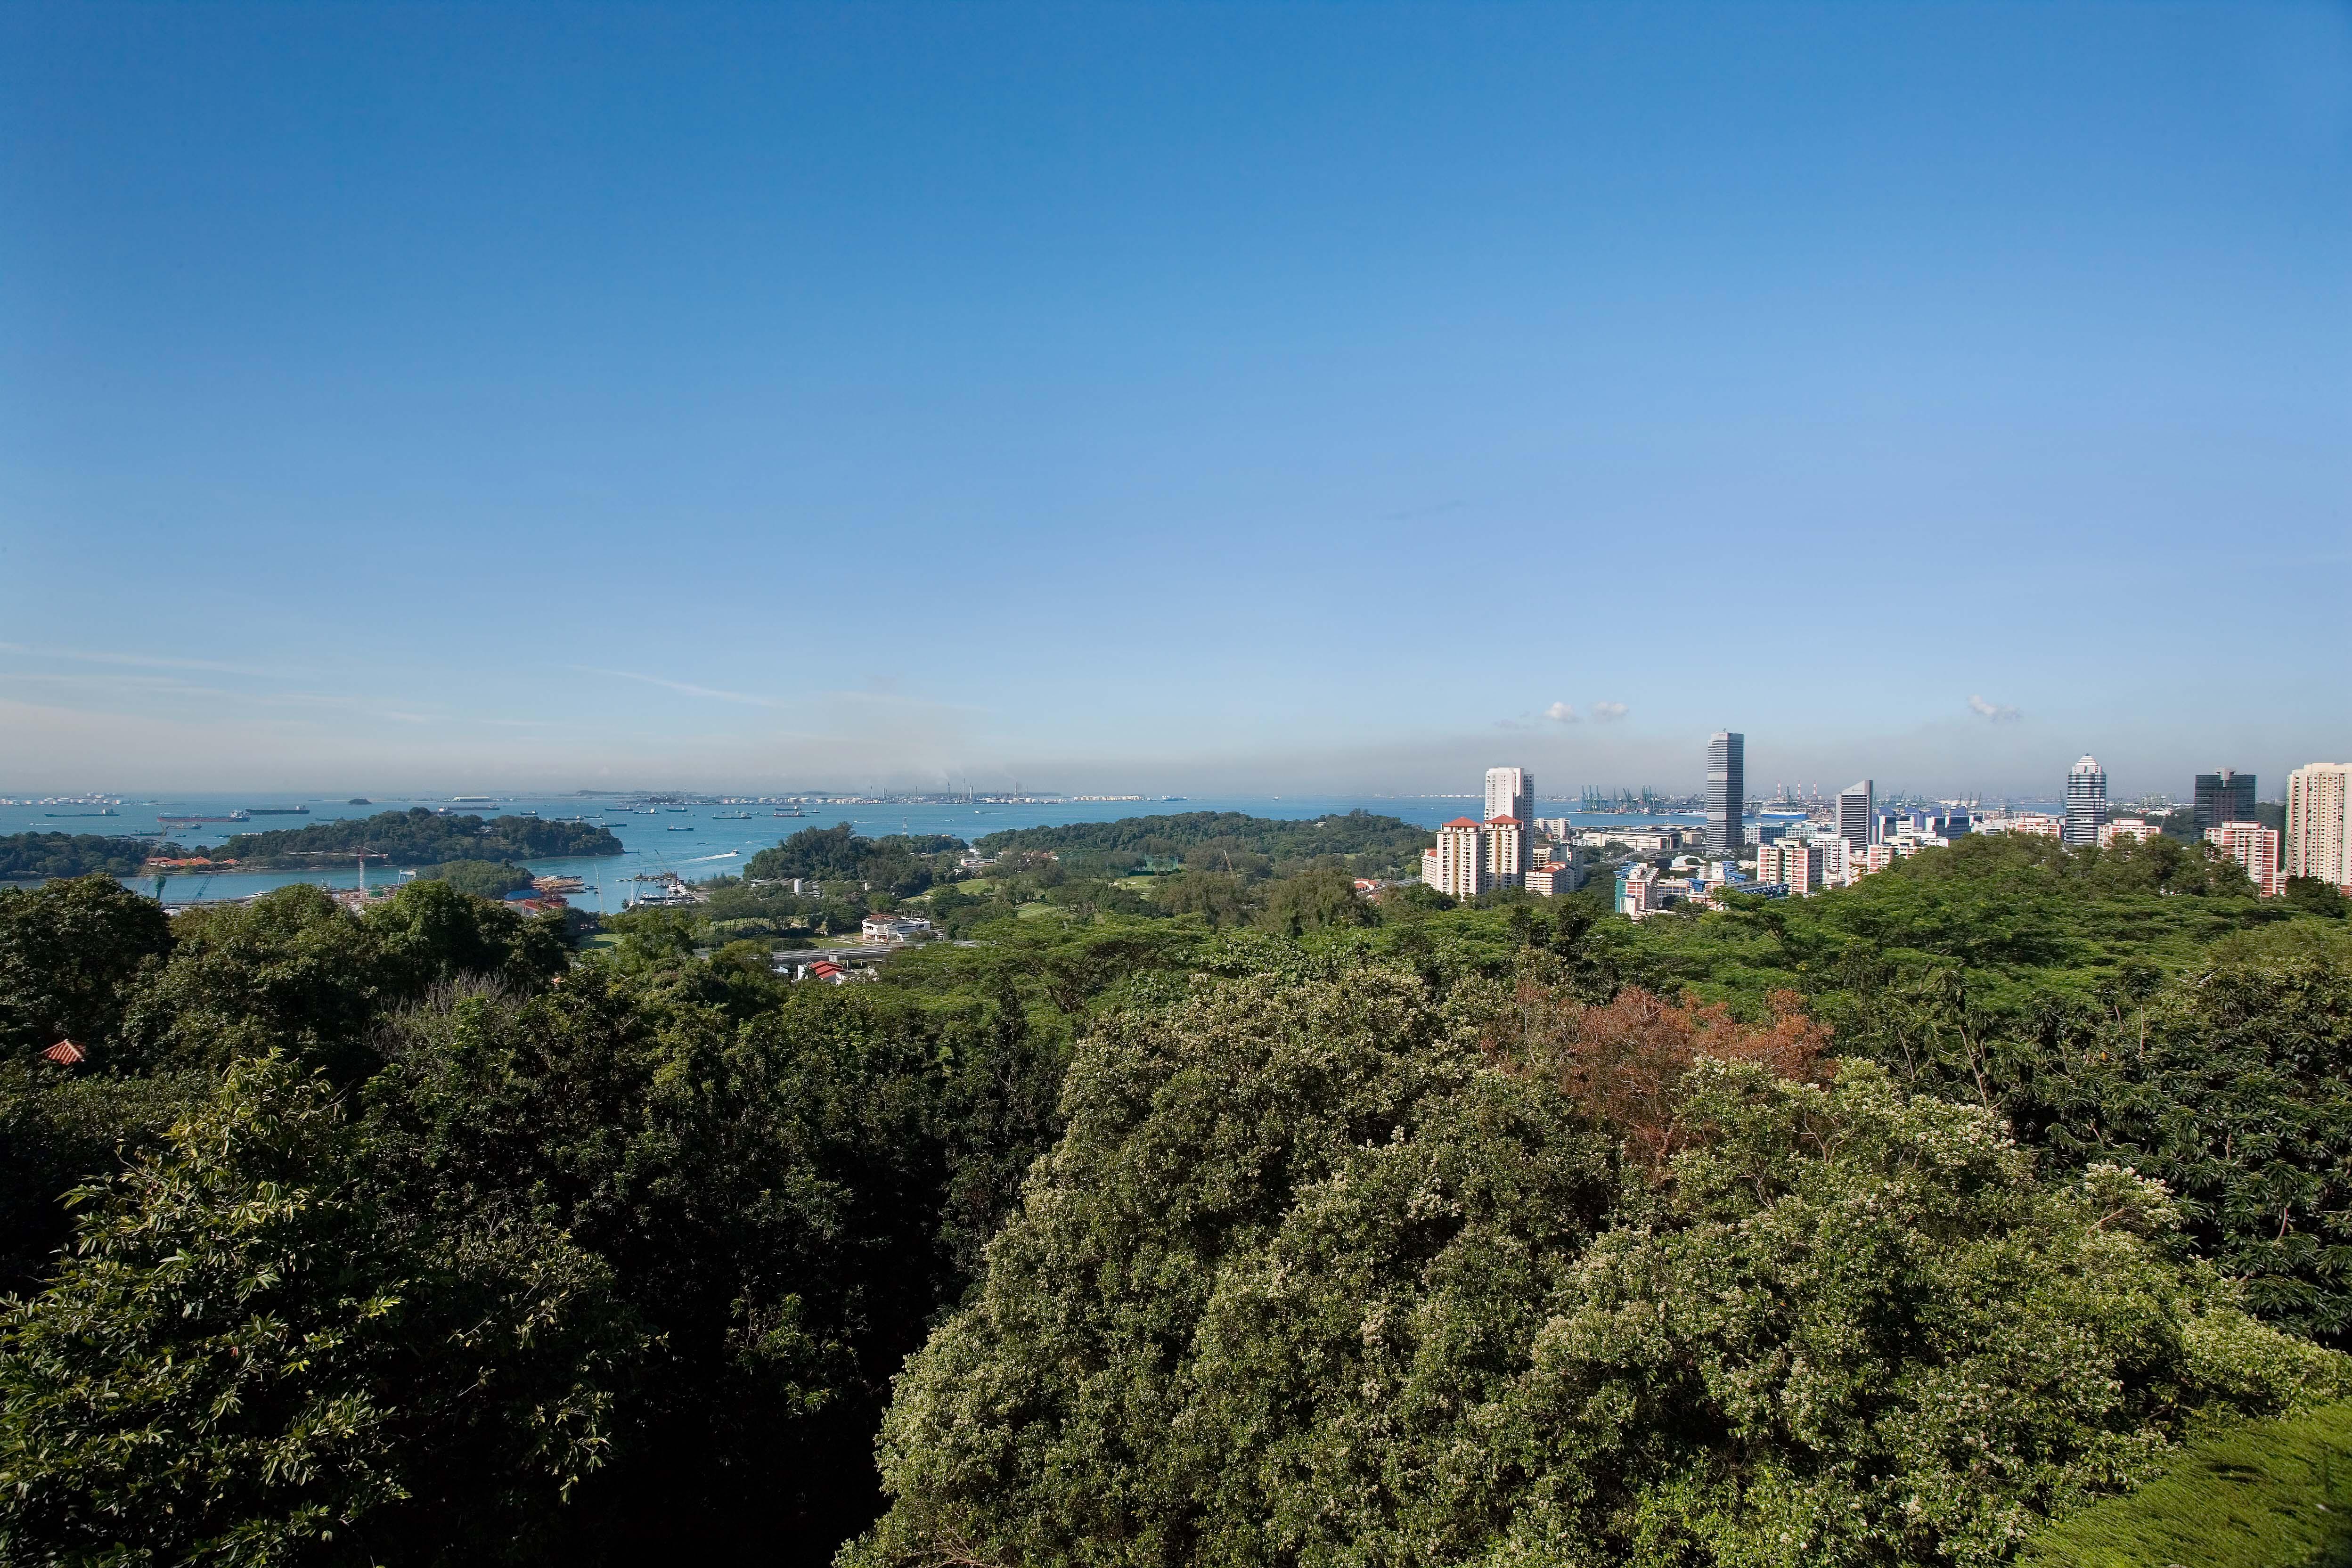 Mount Faber Park Parks Nature Reserves Gardens Luge Ampamp Skyline Singapore 2x